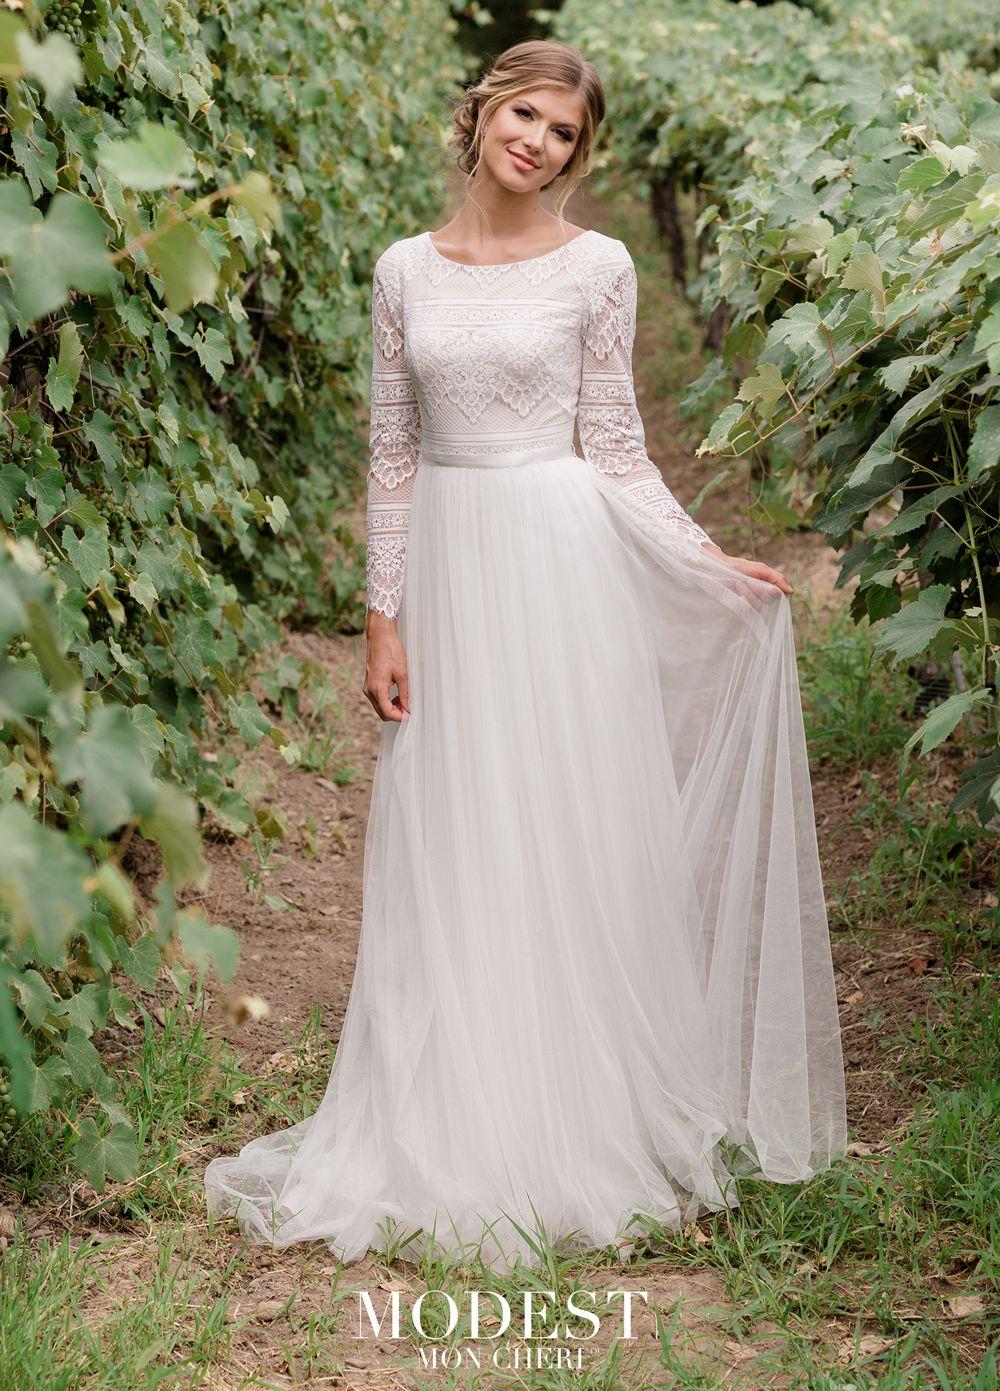 Modest Bridal By Mon Cheri Tr11976 Lace Top Wedding Gown Mon Cheri Wedding Dresses Lace Top Wedding Lace Top Wedding Gowns [ 1391 x 1000 Pixel ]